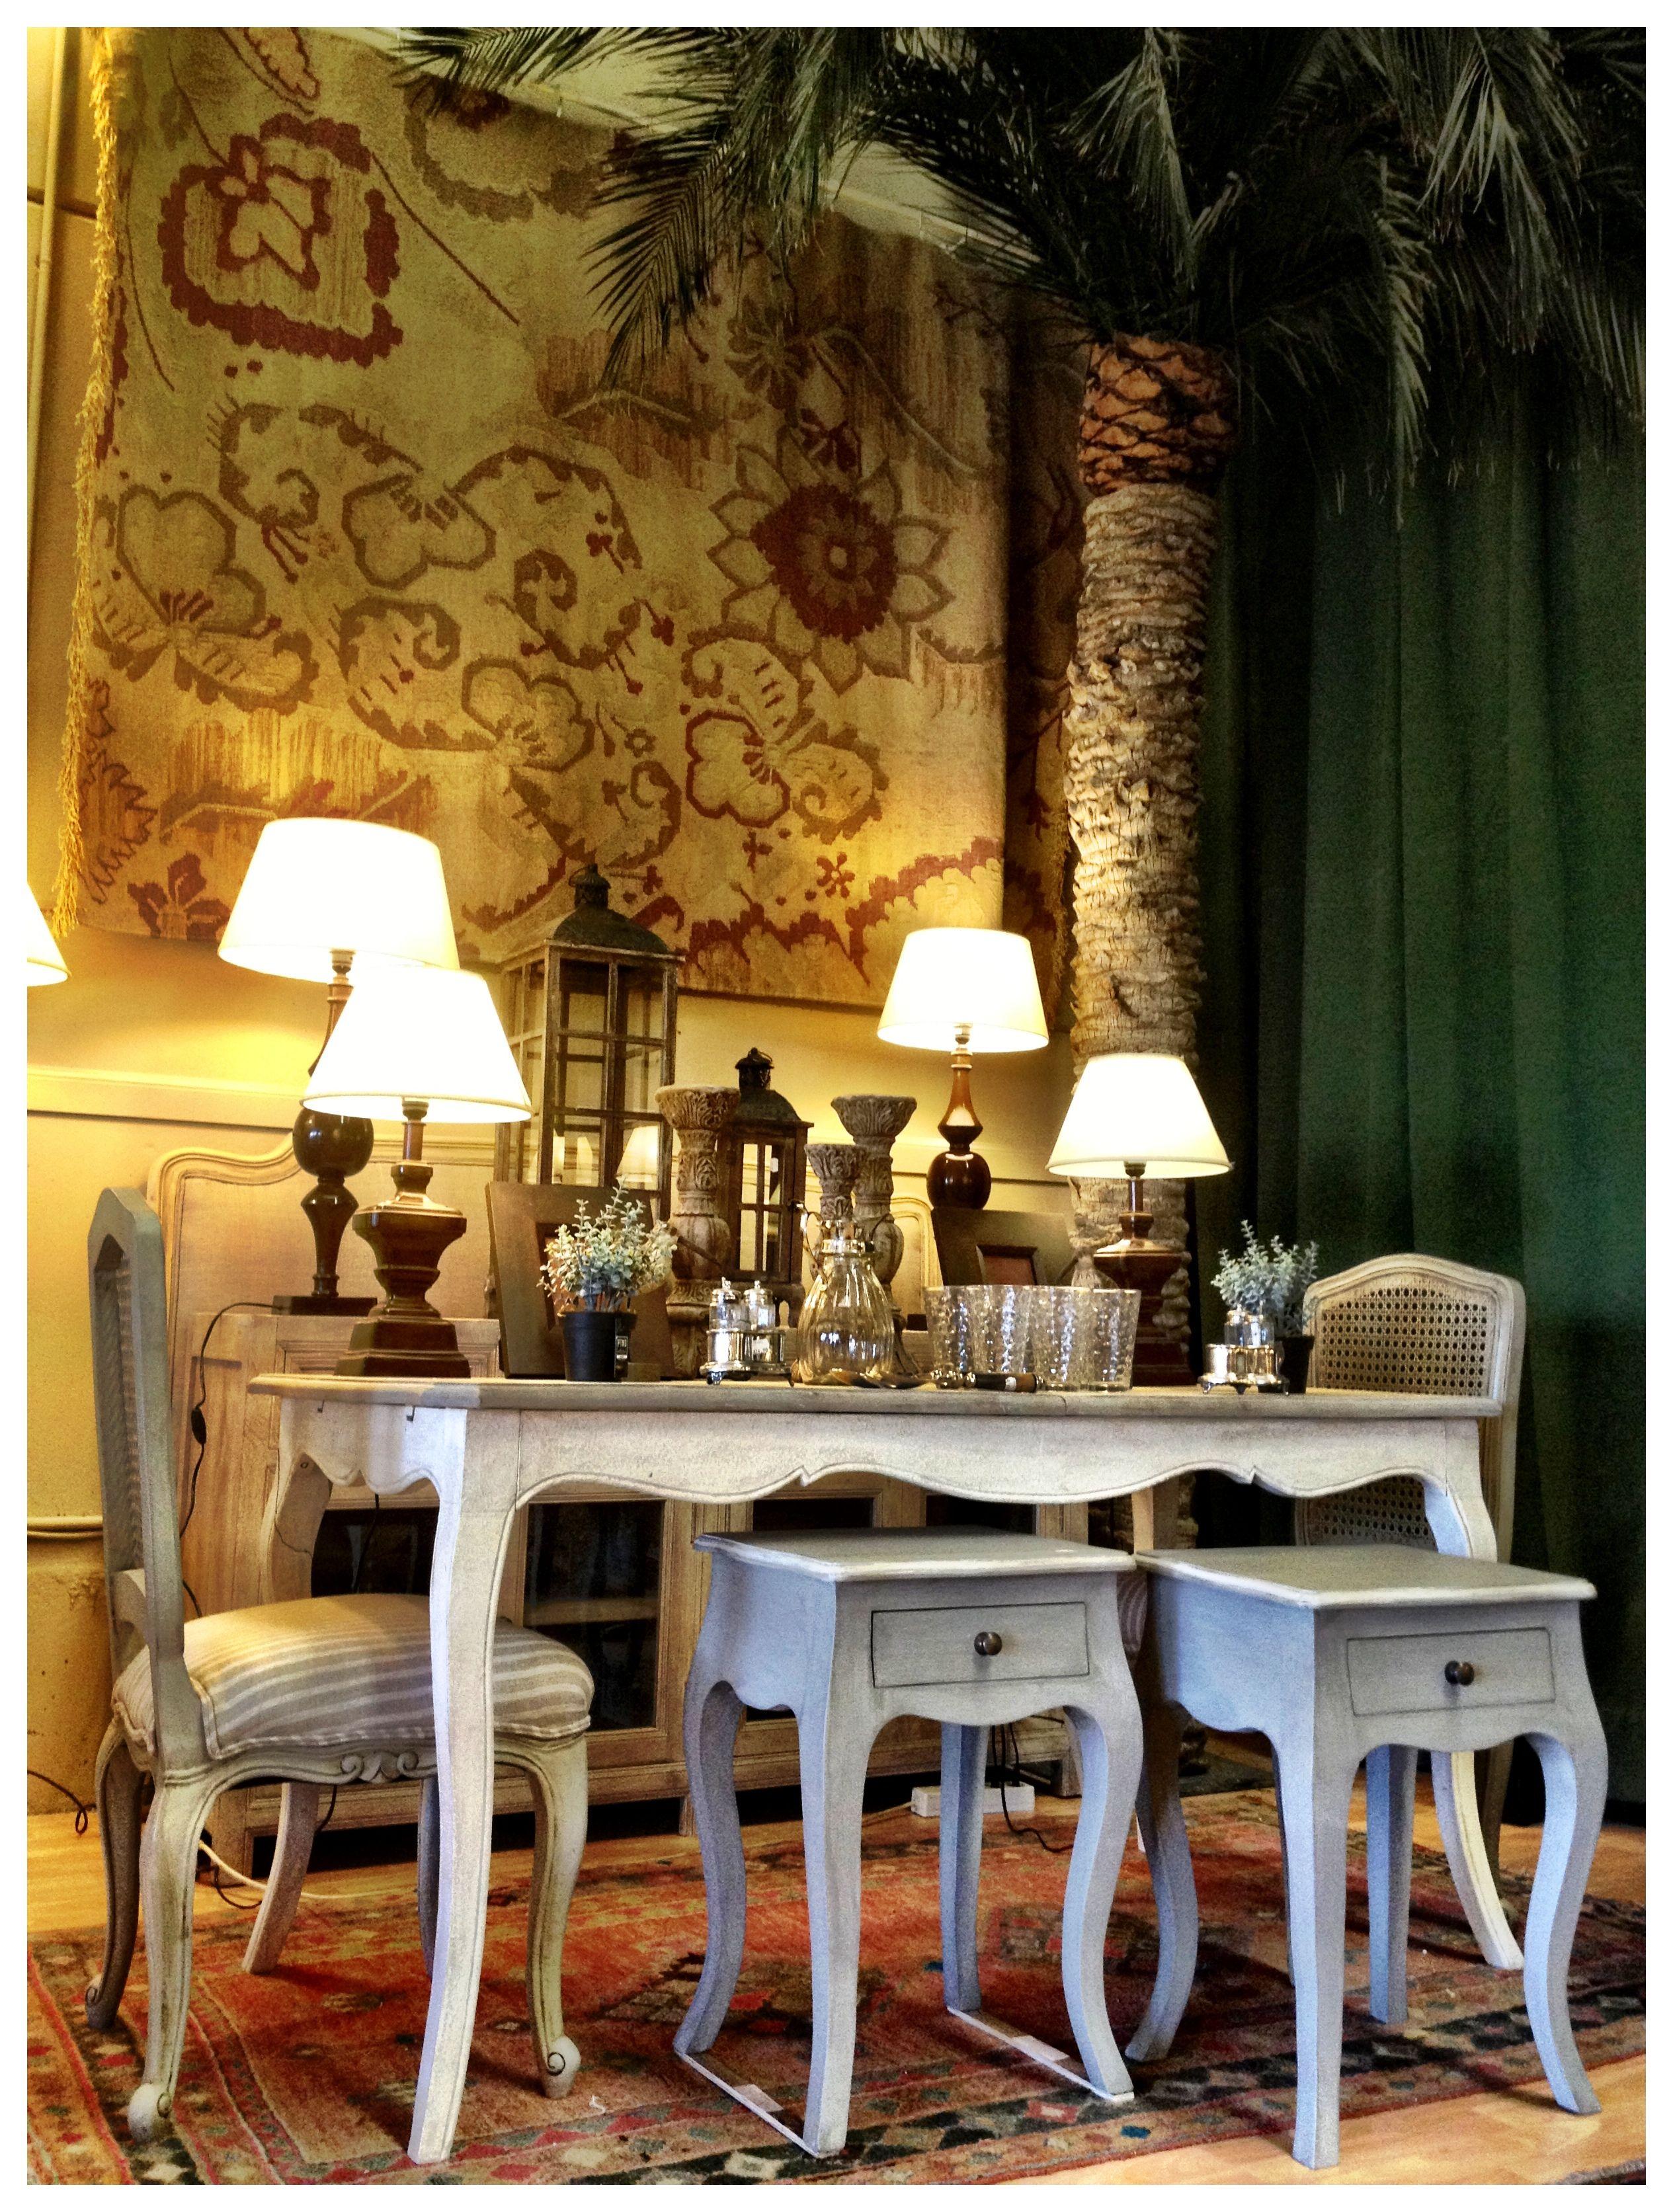 Borgia conti decoraci n madrid for Shop on line casa